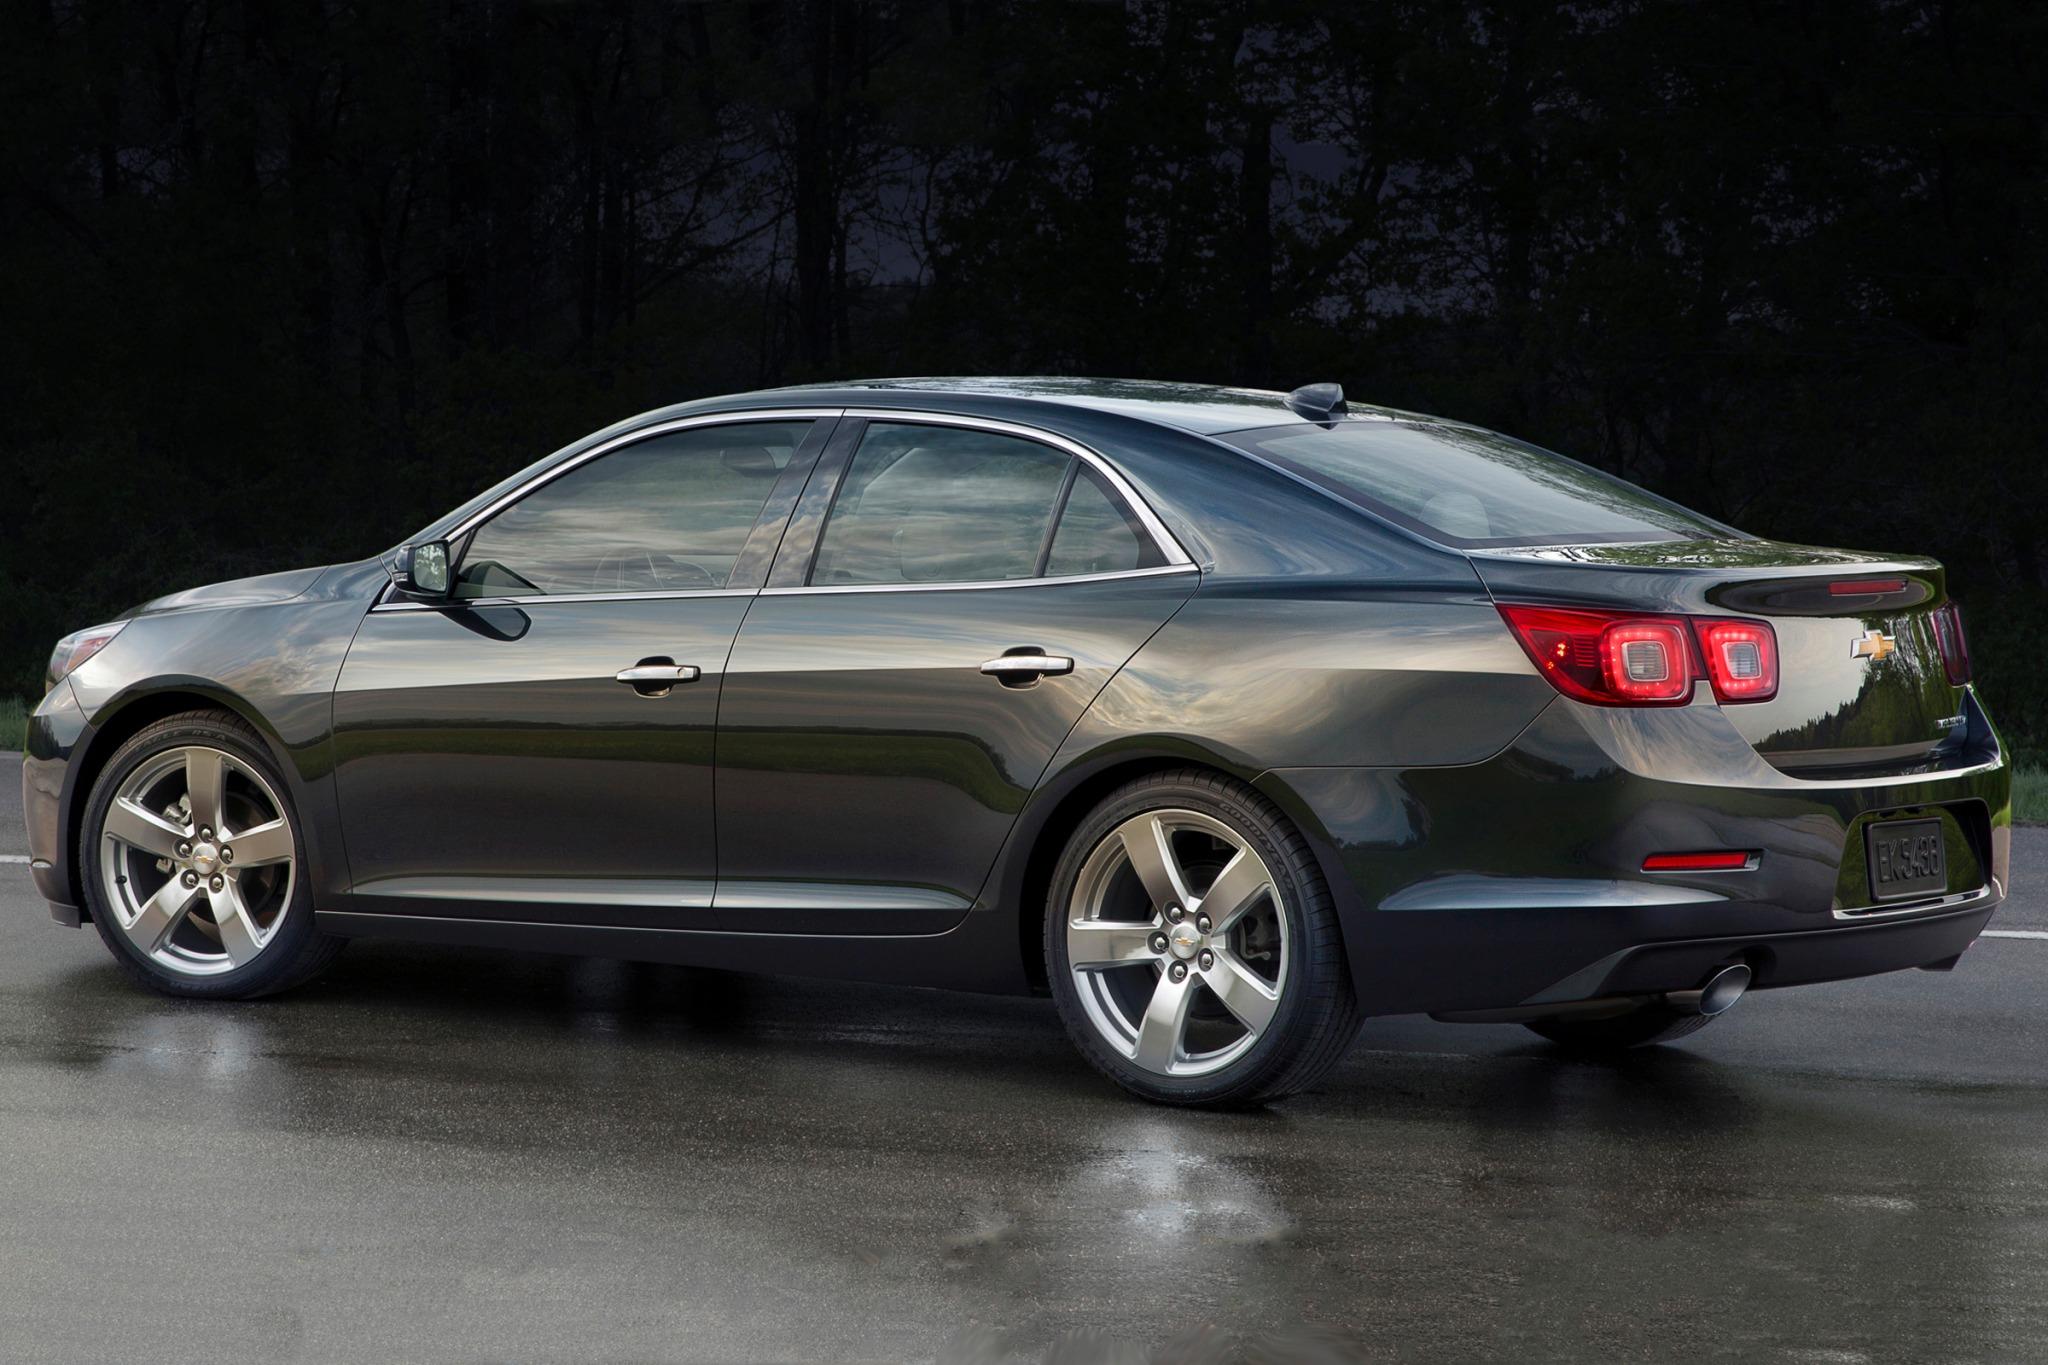 2011 Gmc Terrain Recalls >> 2015 Chevrolet Malibu LS VIN Number Search - AutoDetective